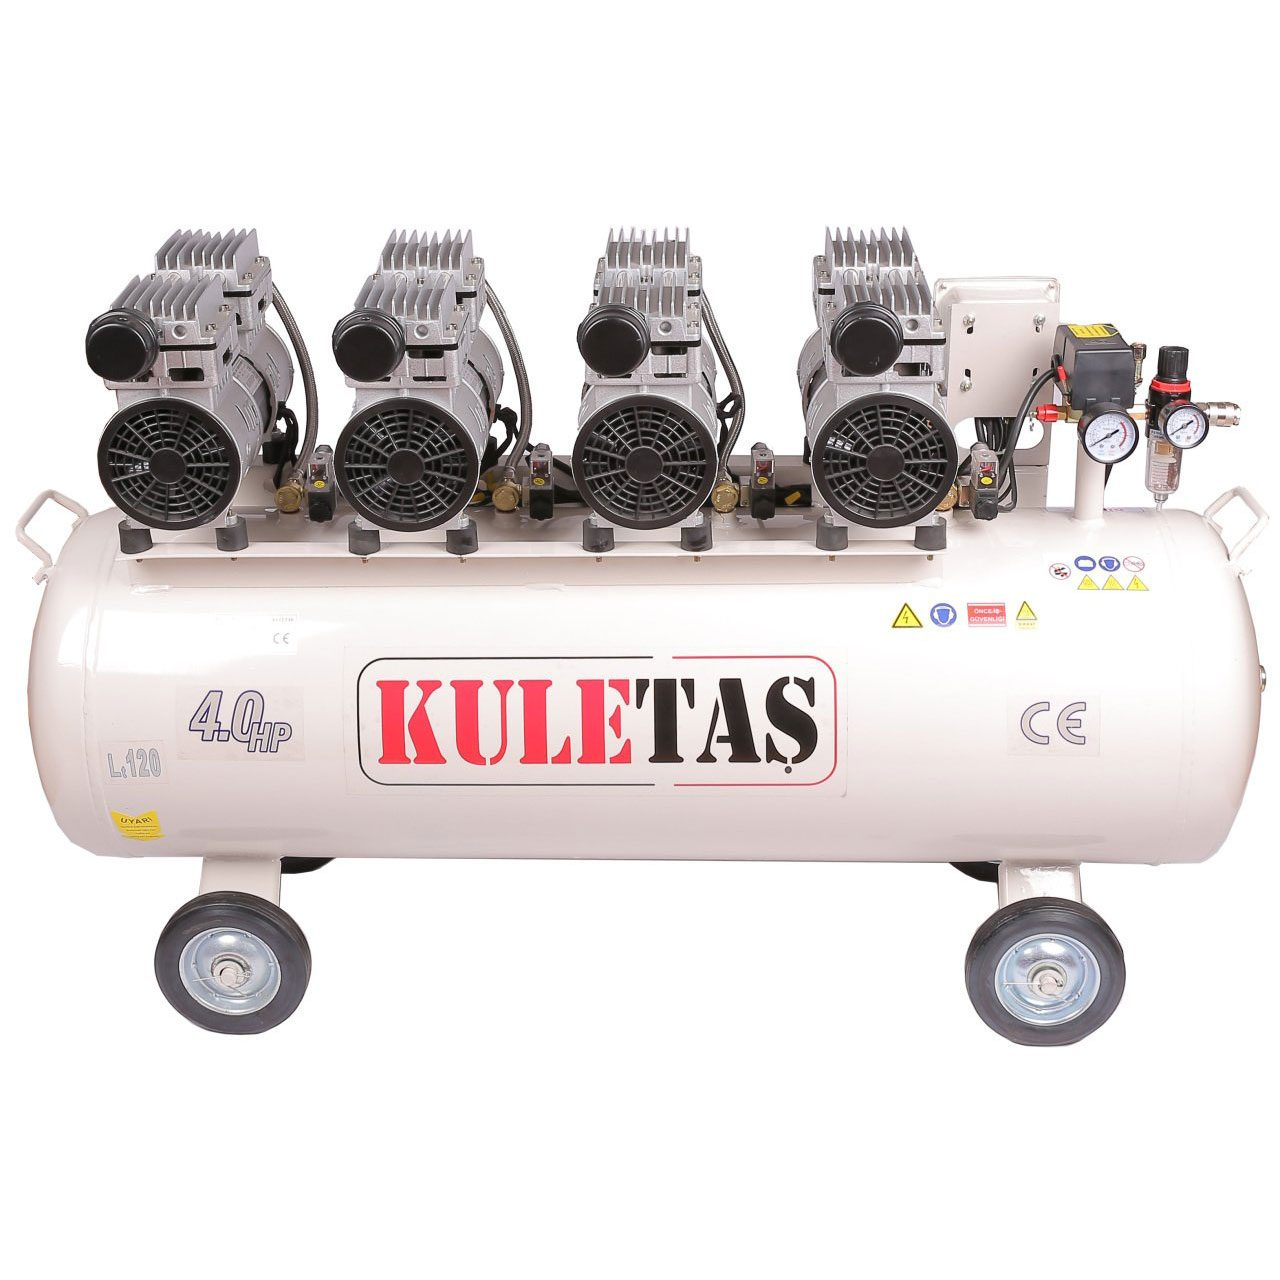 Kuletaş-Süper-Sessiz-Yağsız-Kompresör-120-Litre-4HP